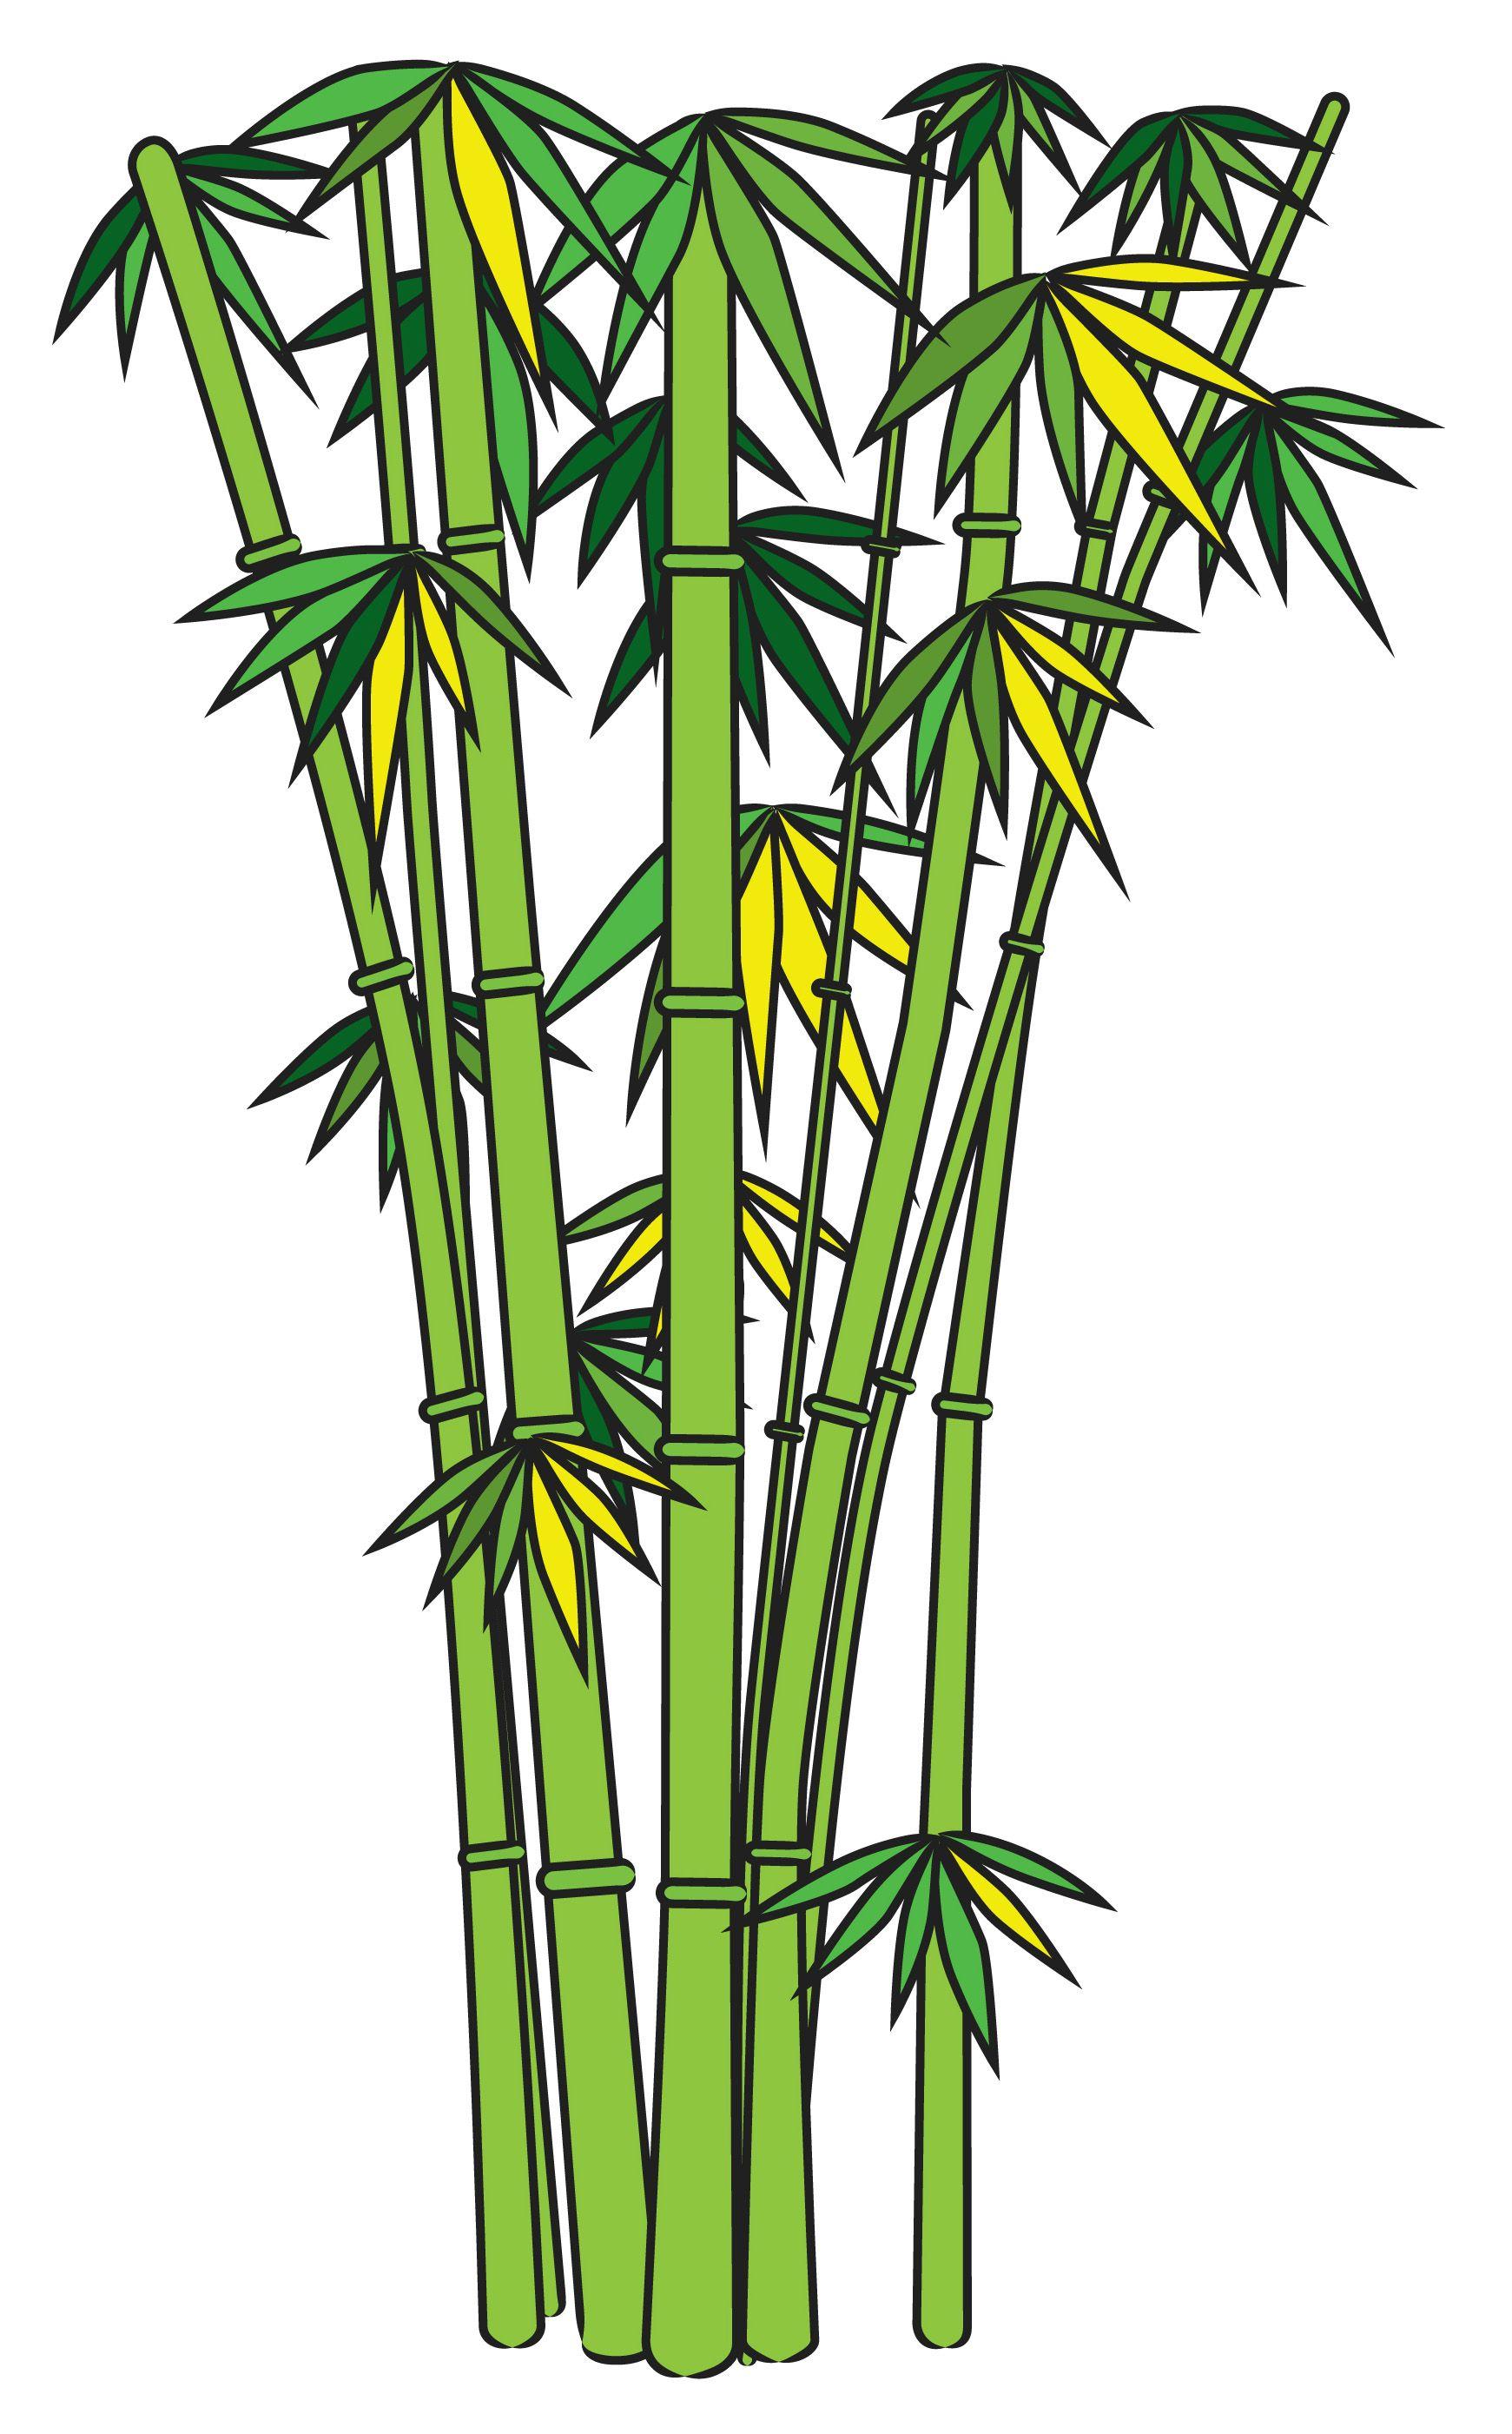 1741x2802 Bamboo Tree Pencil Sketch And Draw Bamboo Creative